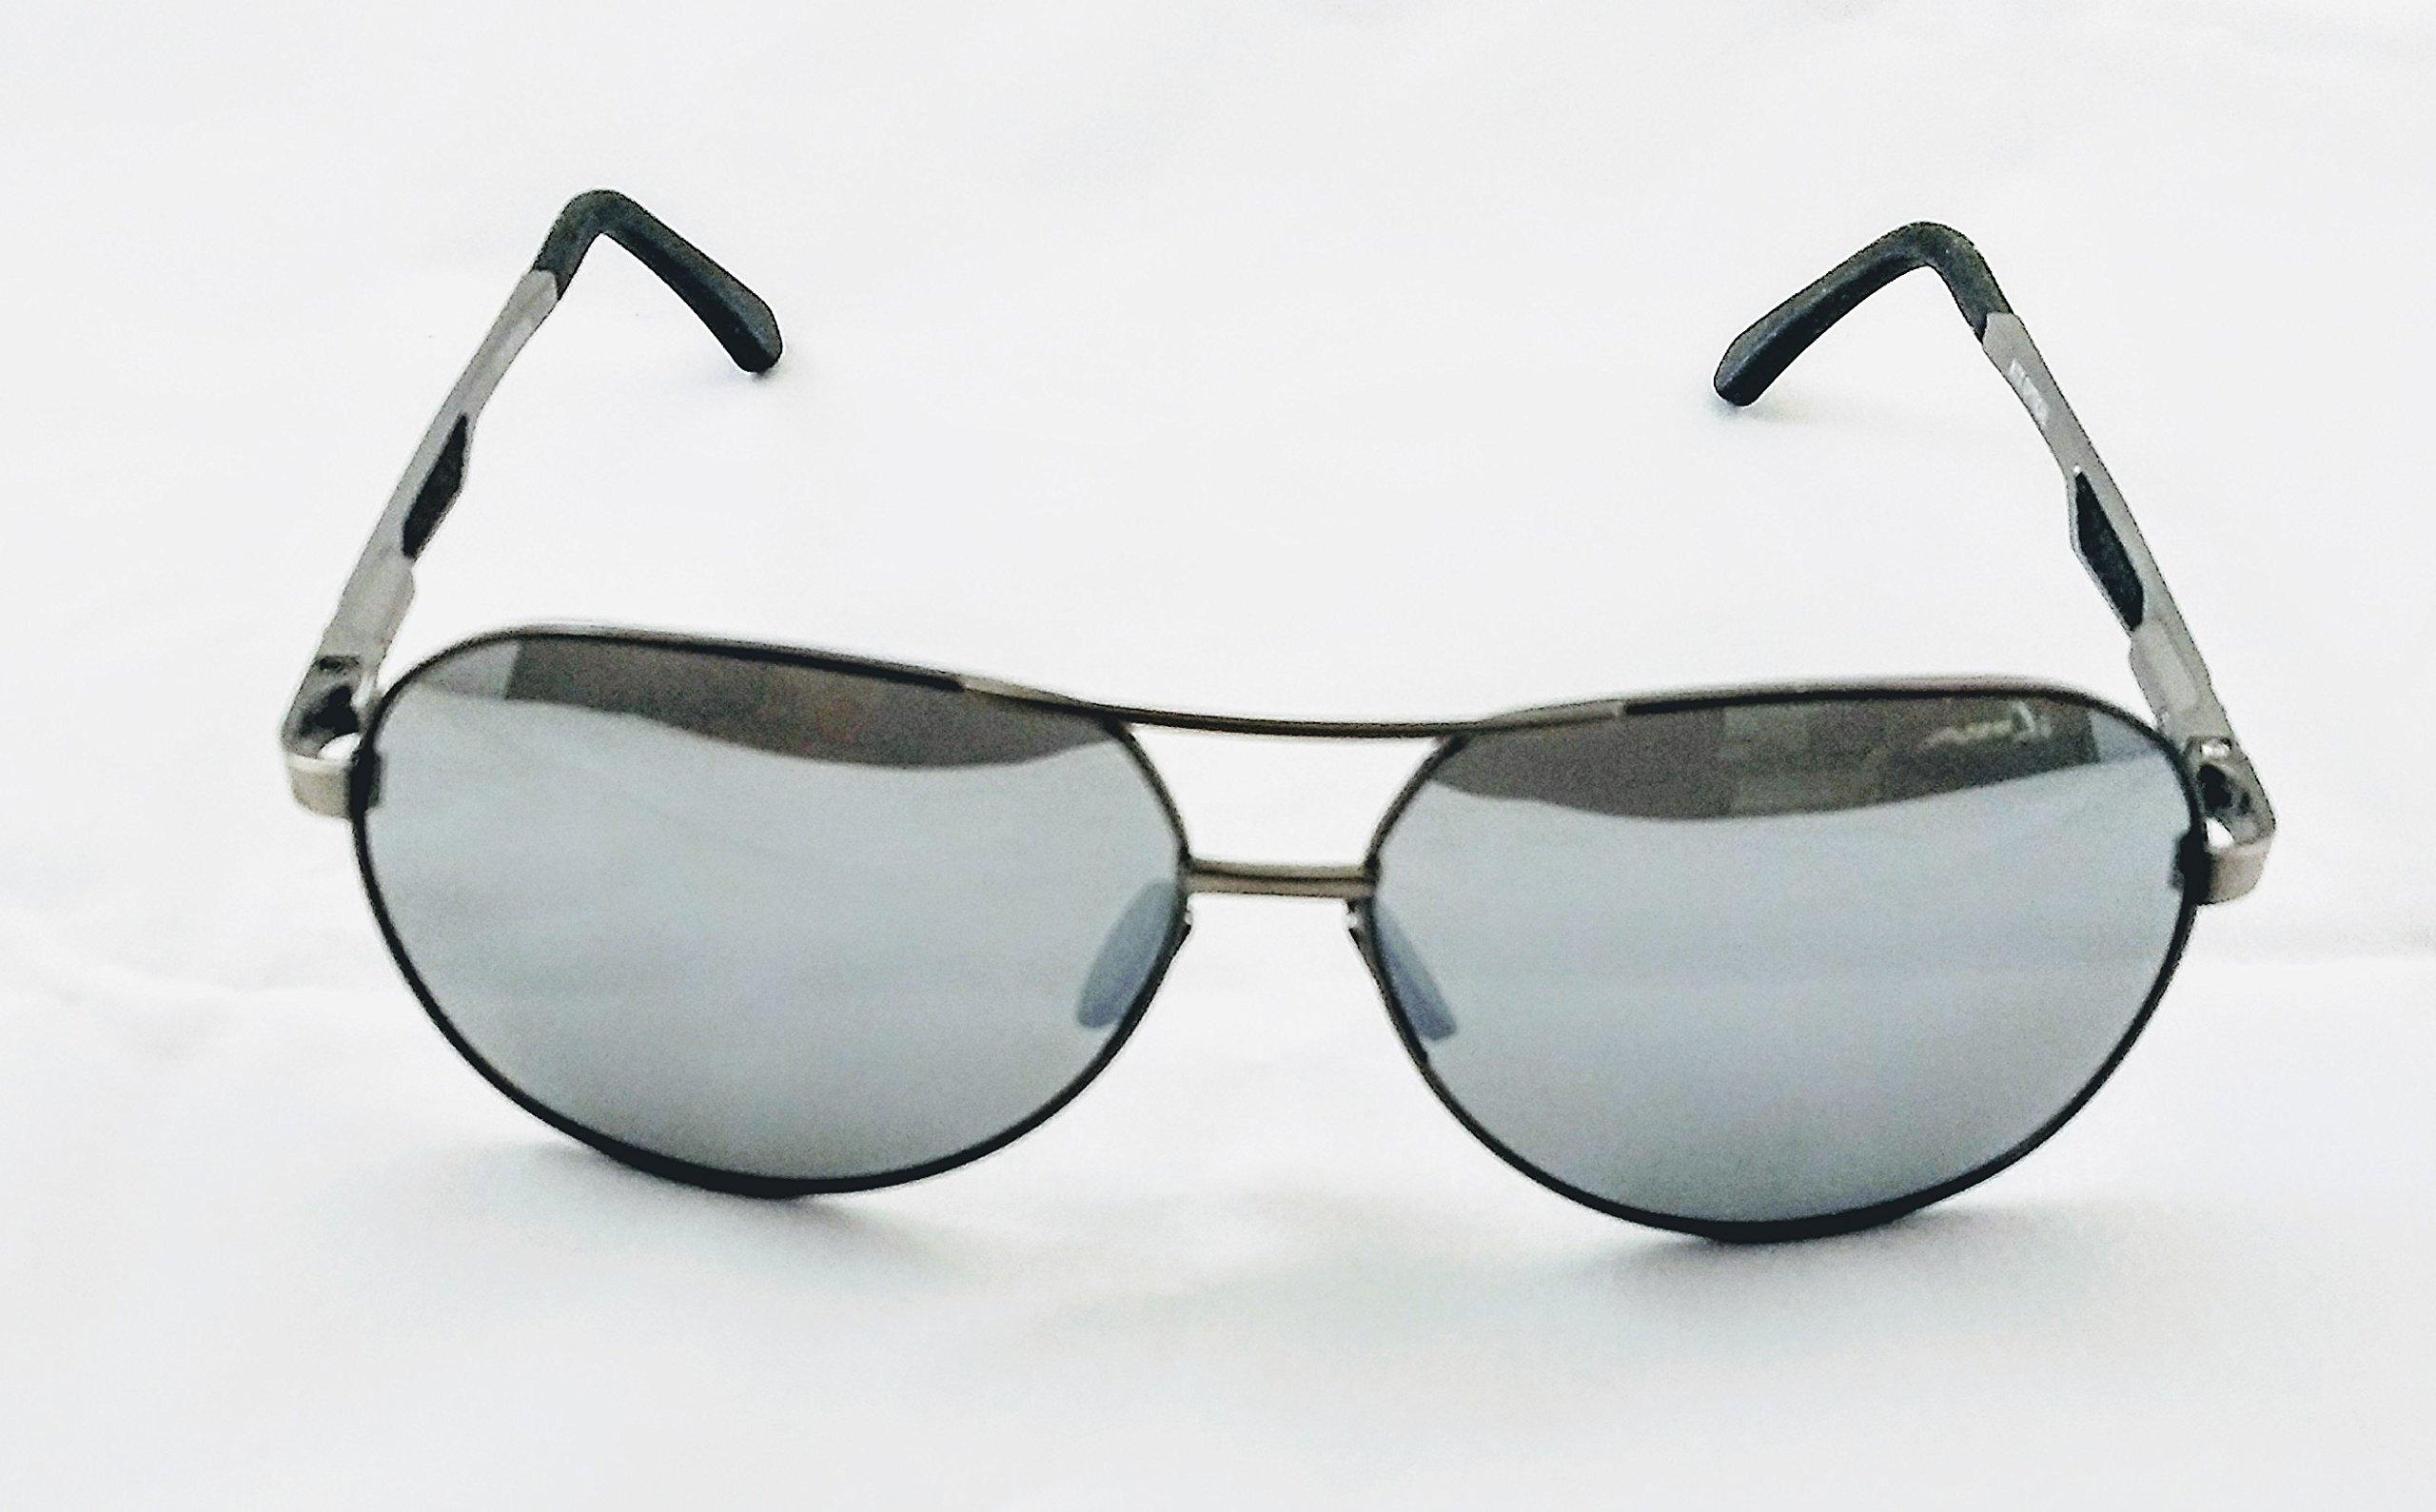 17c43b81e8 XXL extra large Classic Pilot Polarized Sunglasses for big wide heads 150mm